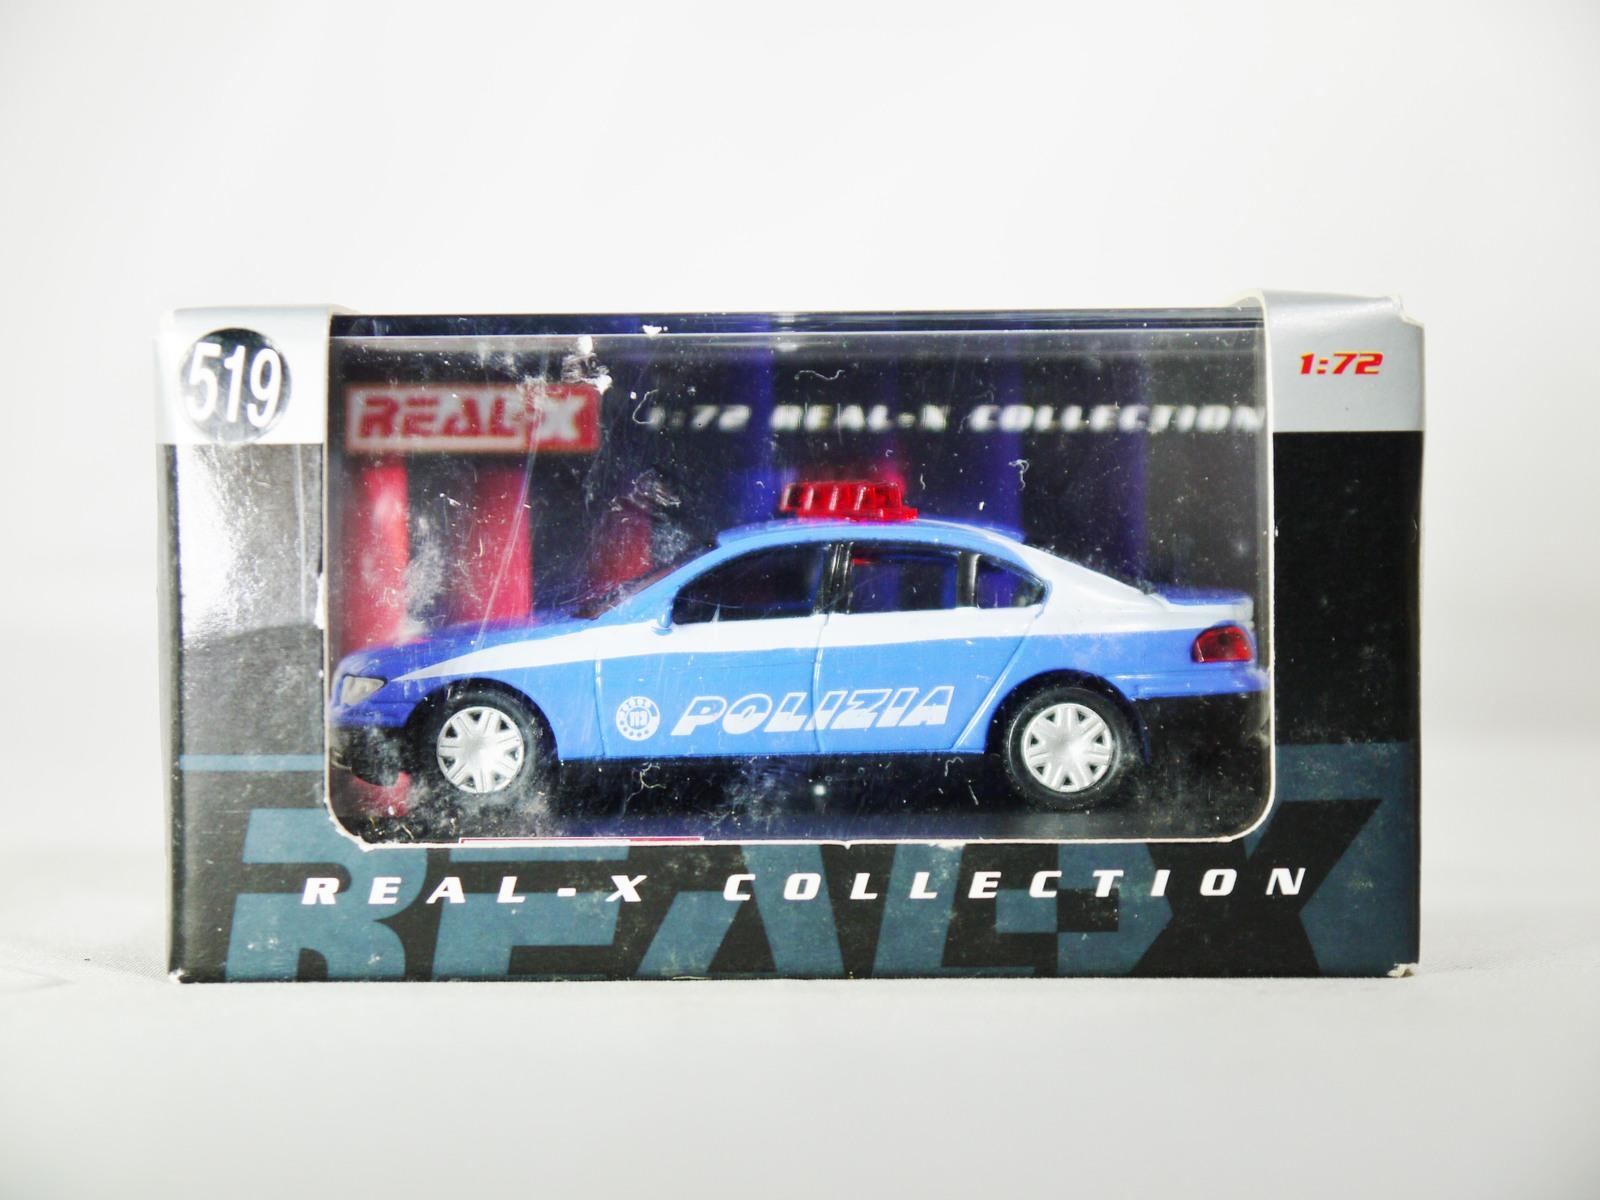 1/72 REAL-X Model Collection ITALY POLIZIA No. 519 BMW 7 Series Patrol Car